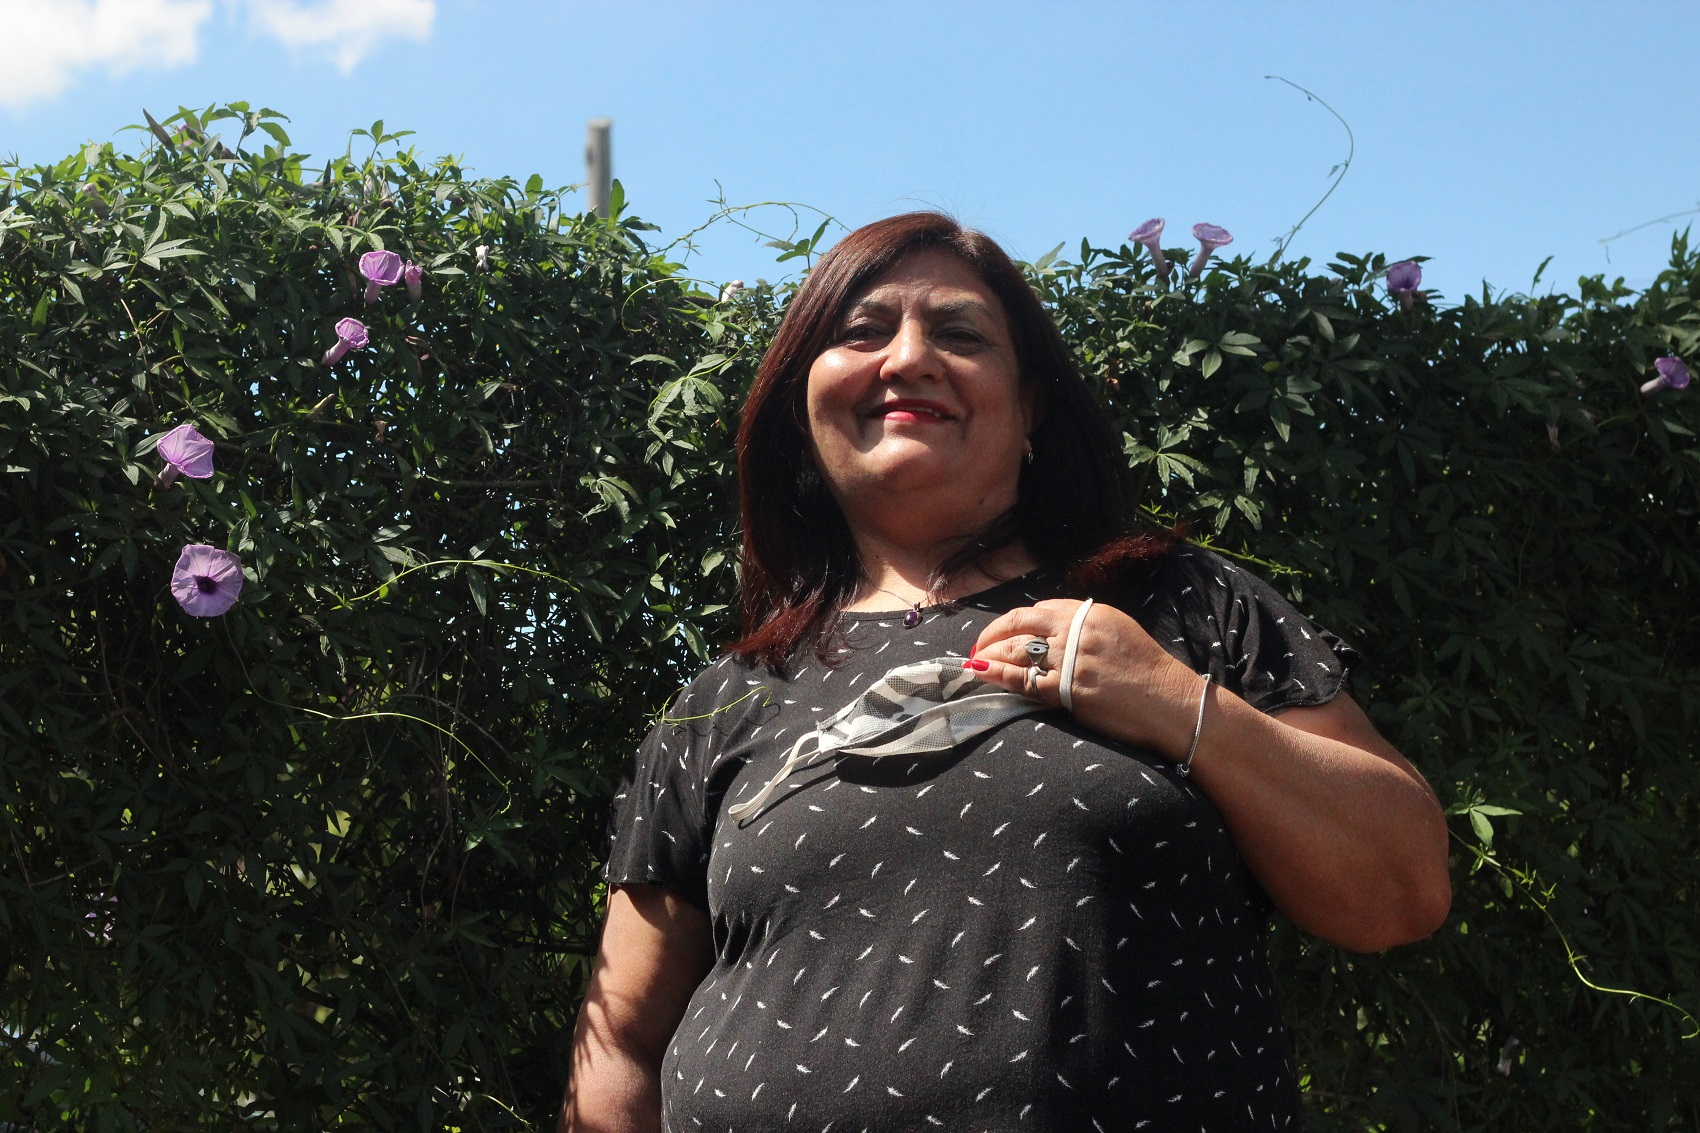 Violeta Ortiz